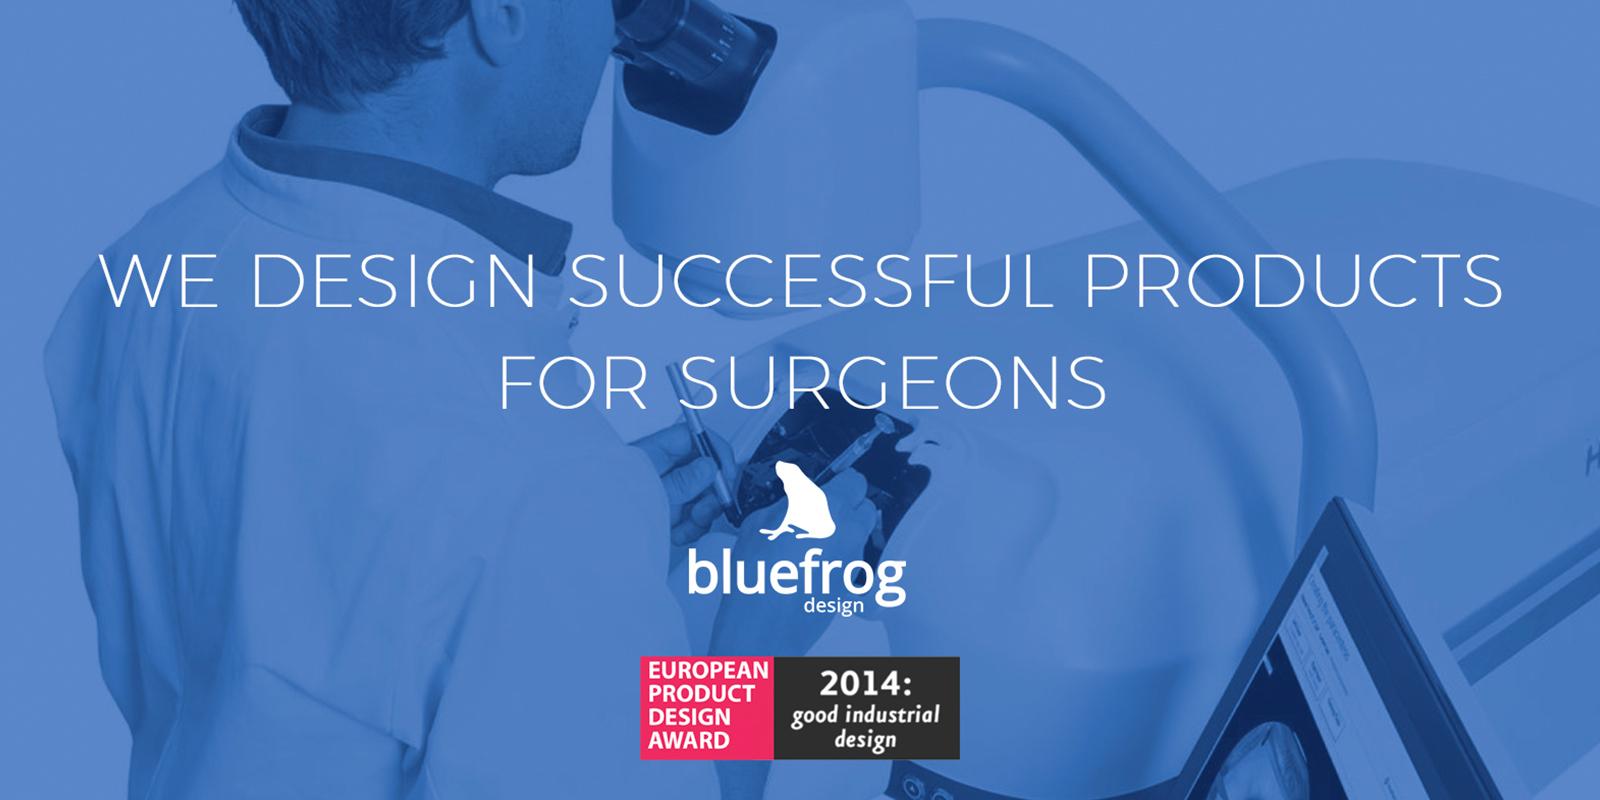 blue_frog_surgeons.jpg